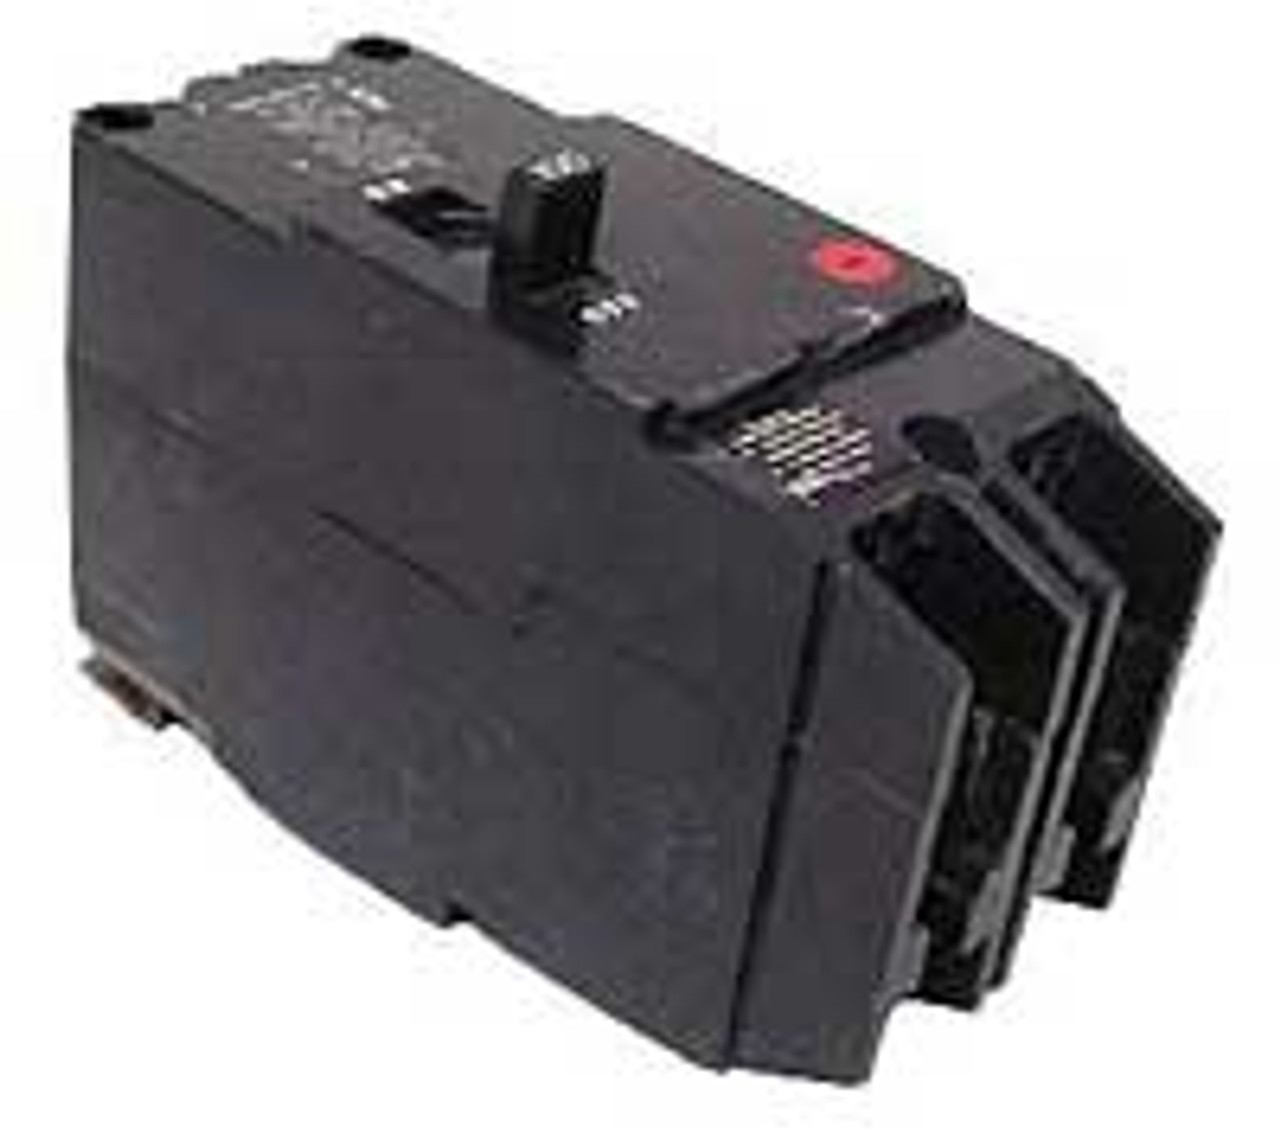 General Electric TEY260 2 Pole 60 Amp 480VAC Circuit Breaker - Used